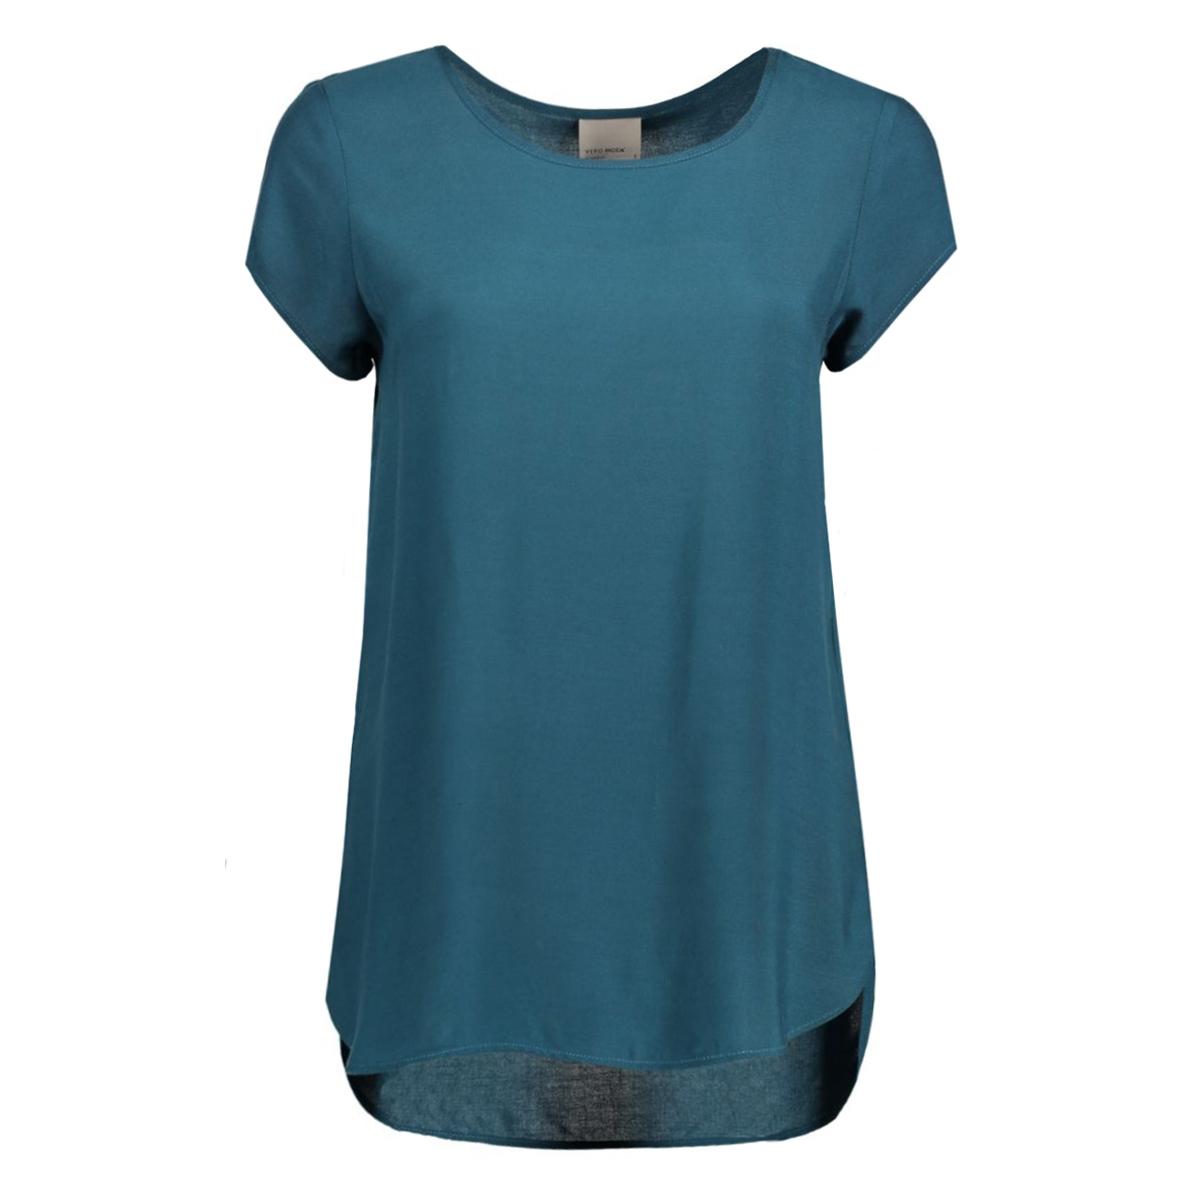 boca ss blouse color 10104053 vero moda t-shirt reflecting pond